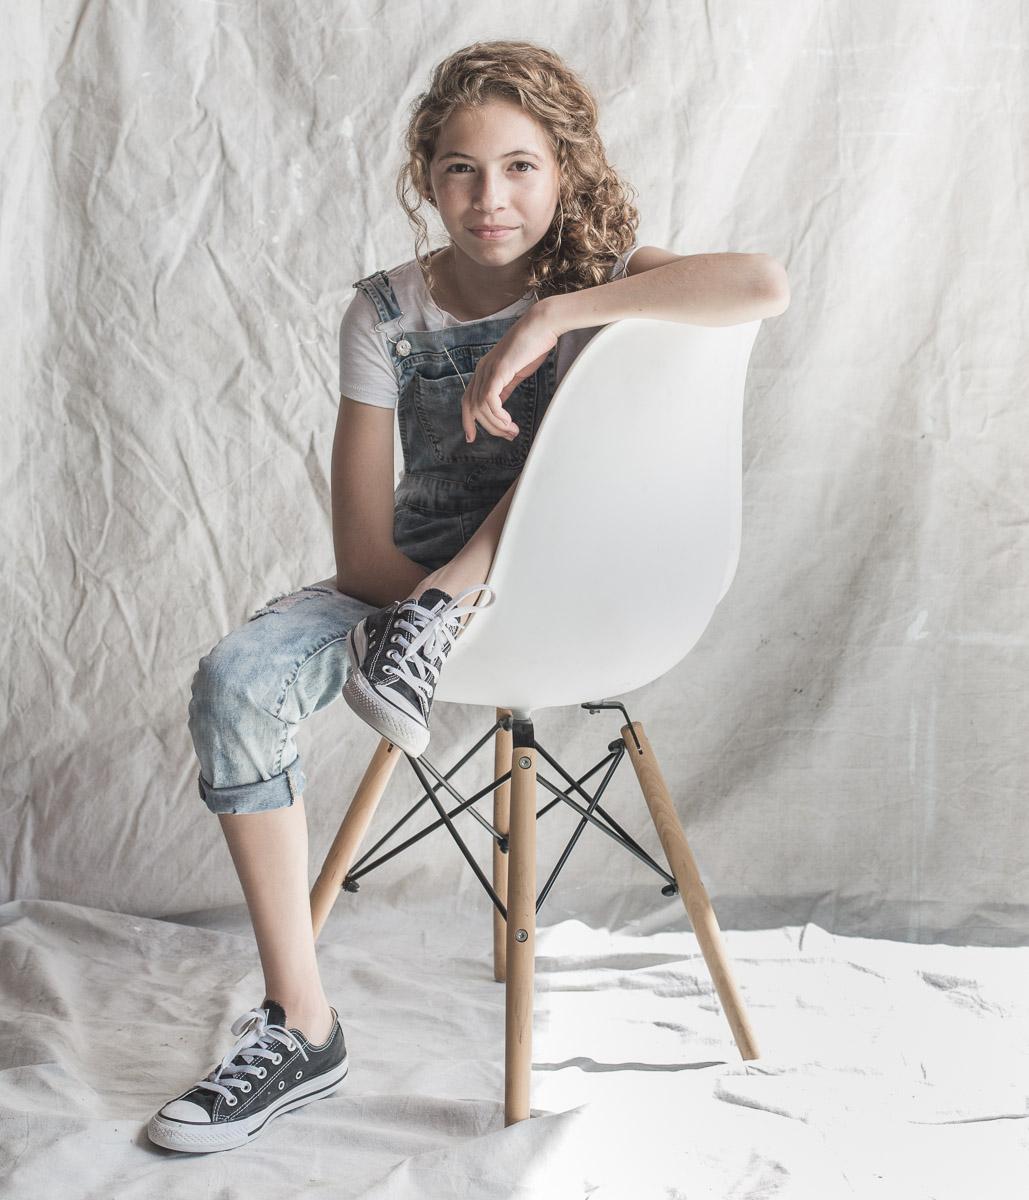 Teen girl in chair by Ryan Pavlovich Photography